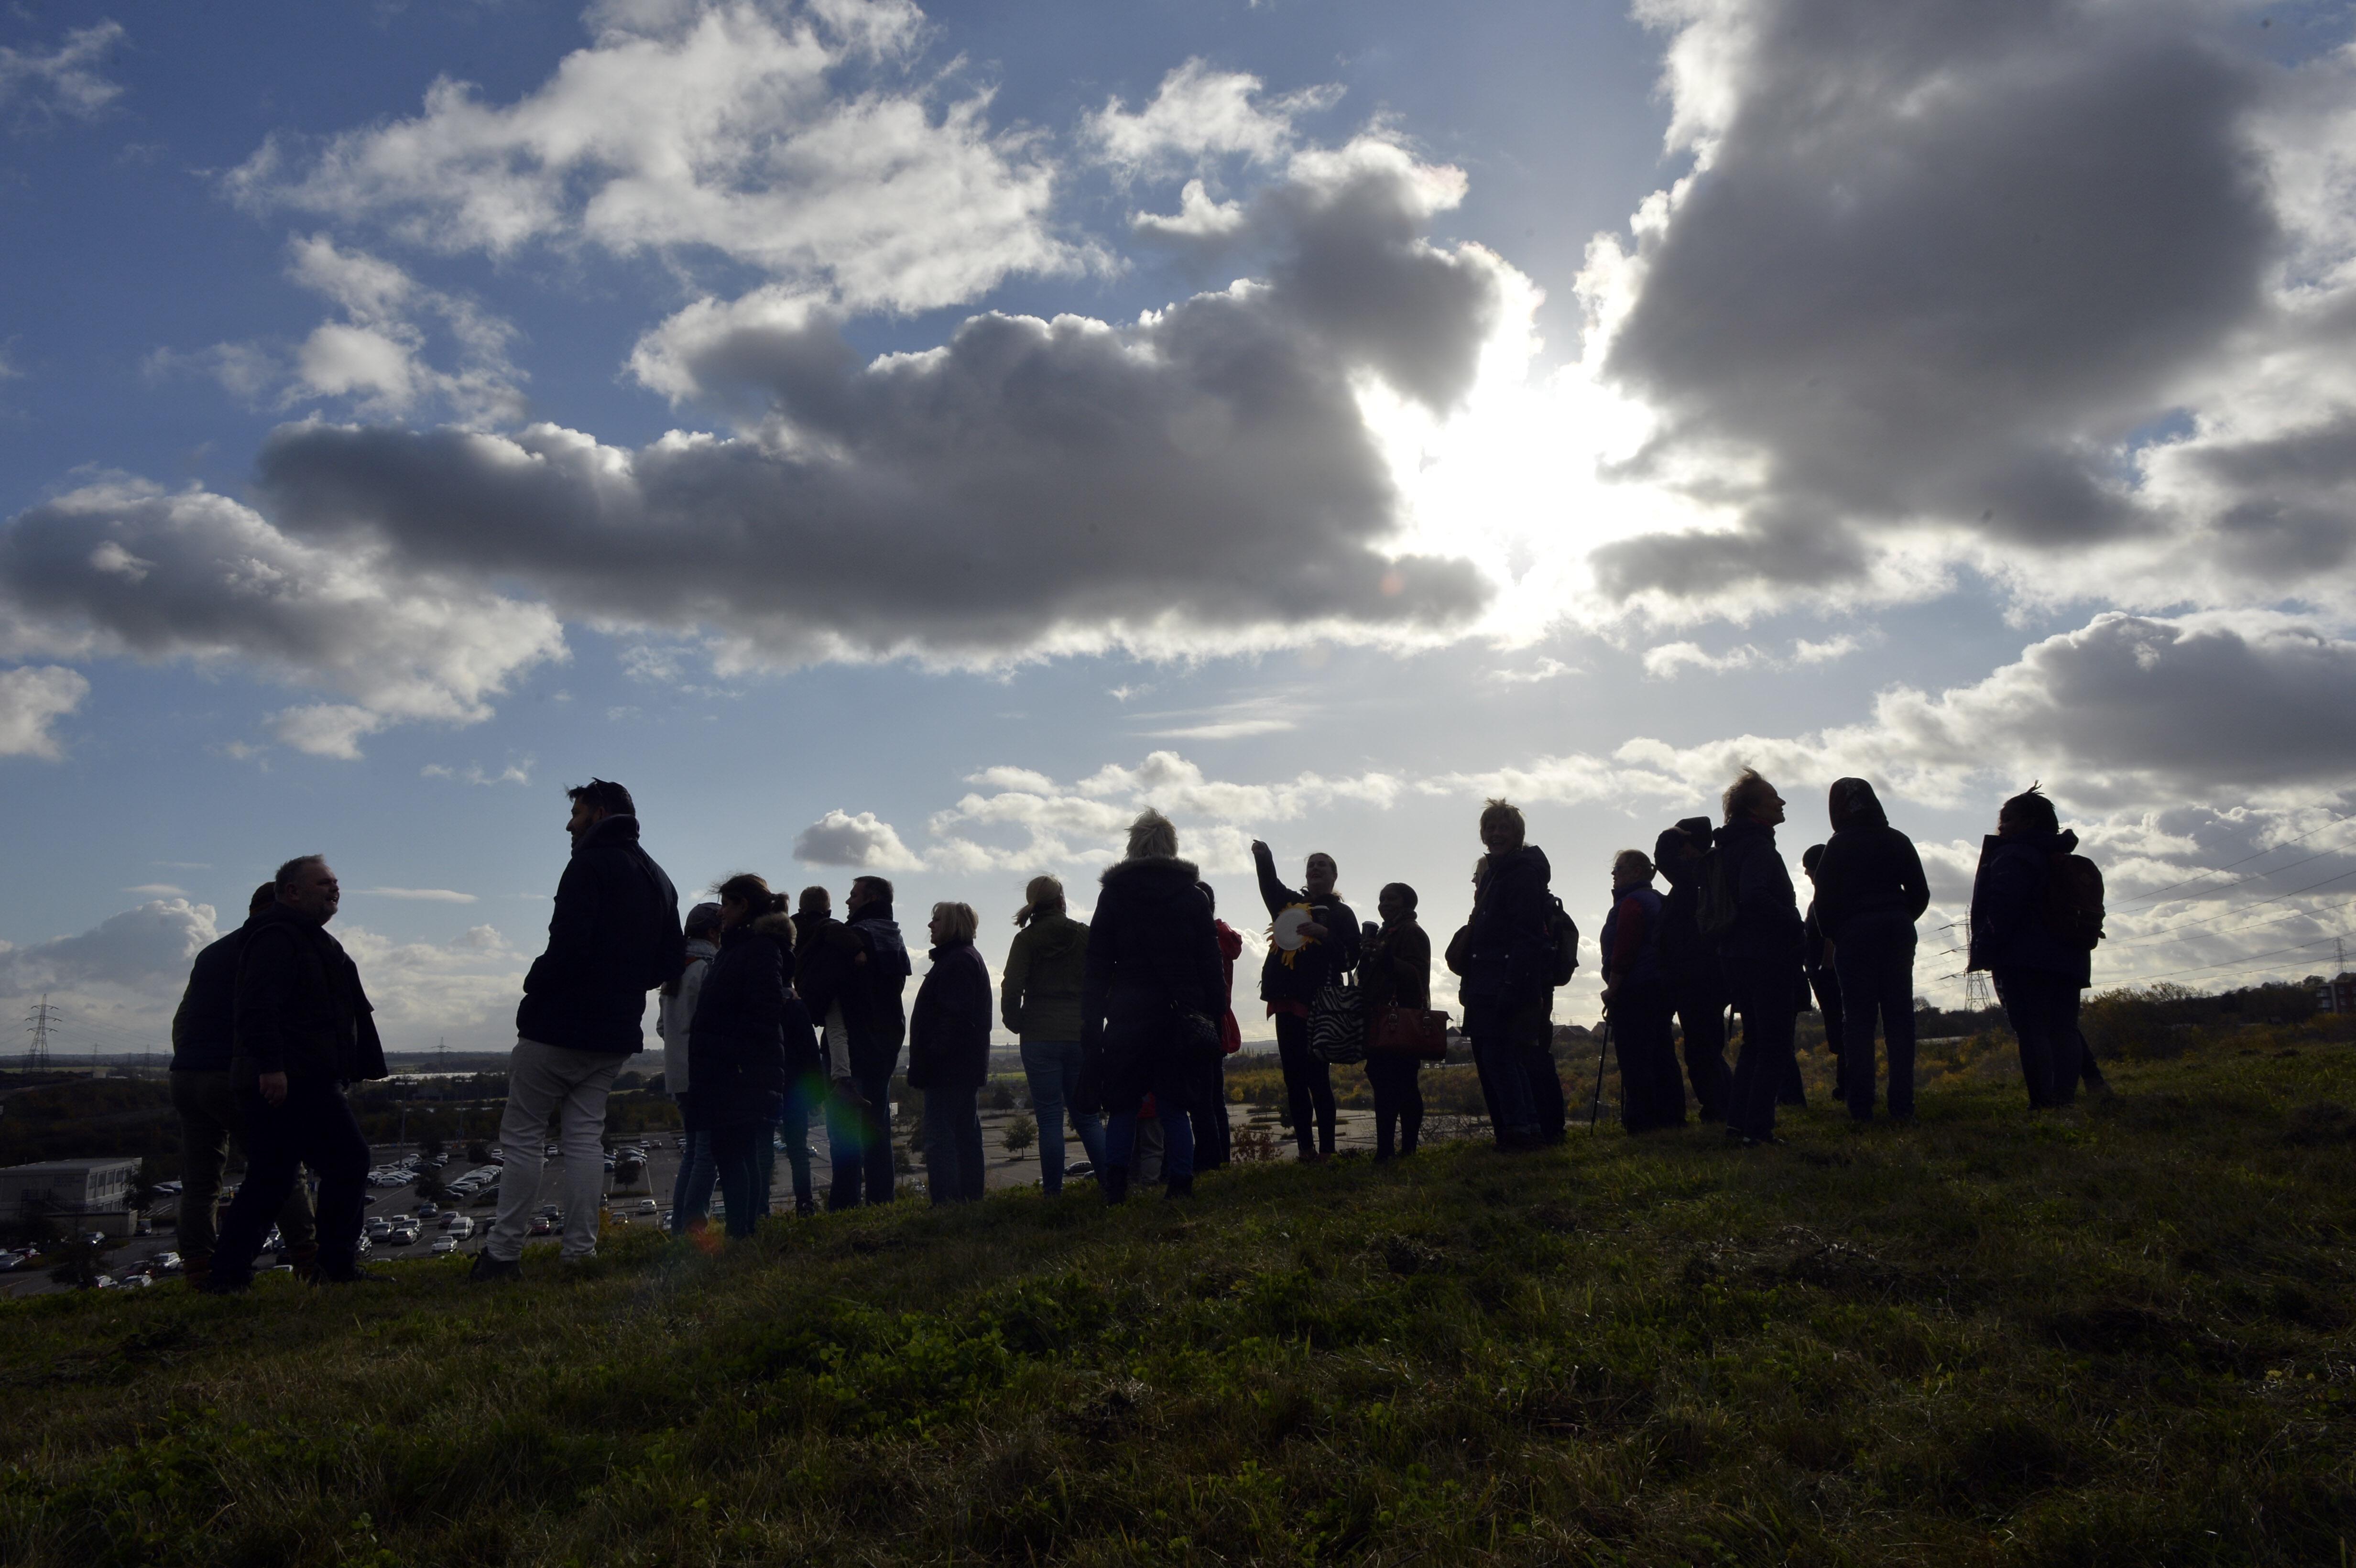 silhoette of people standing in field